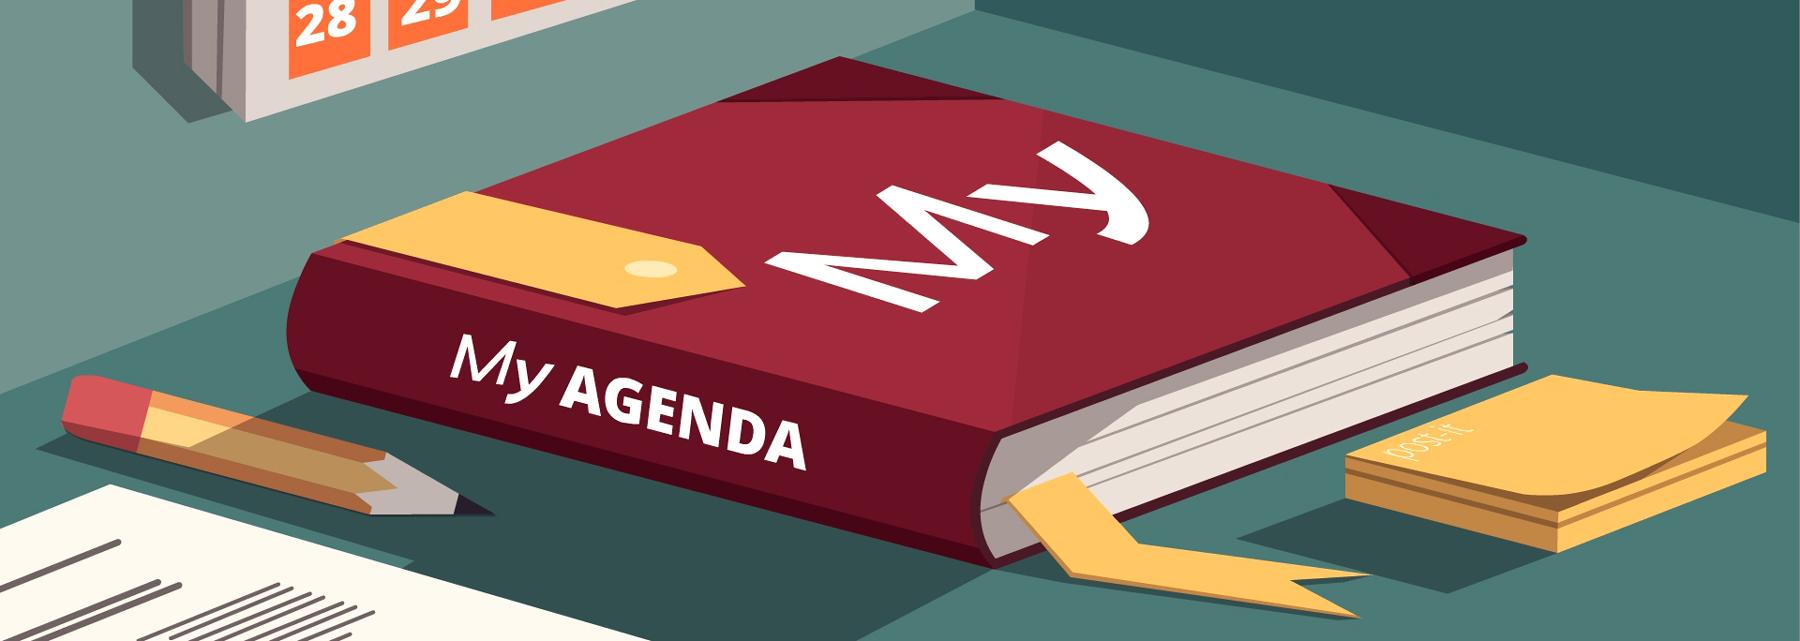 The user's agenda